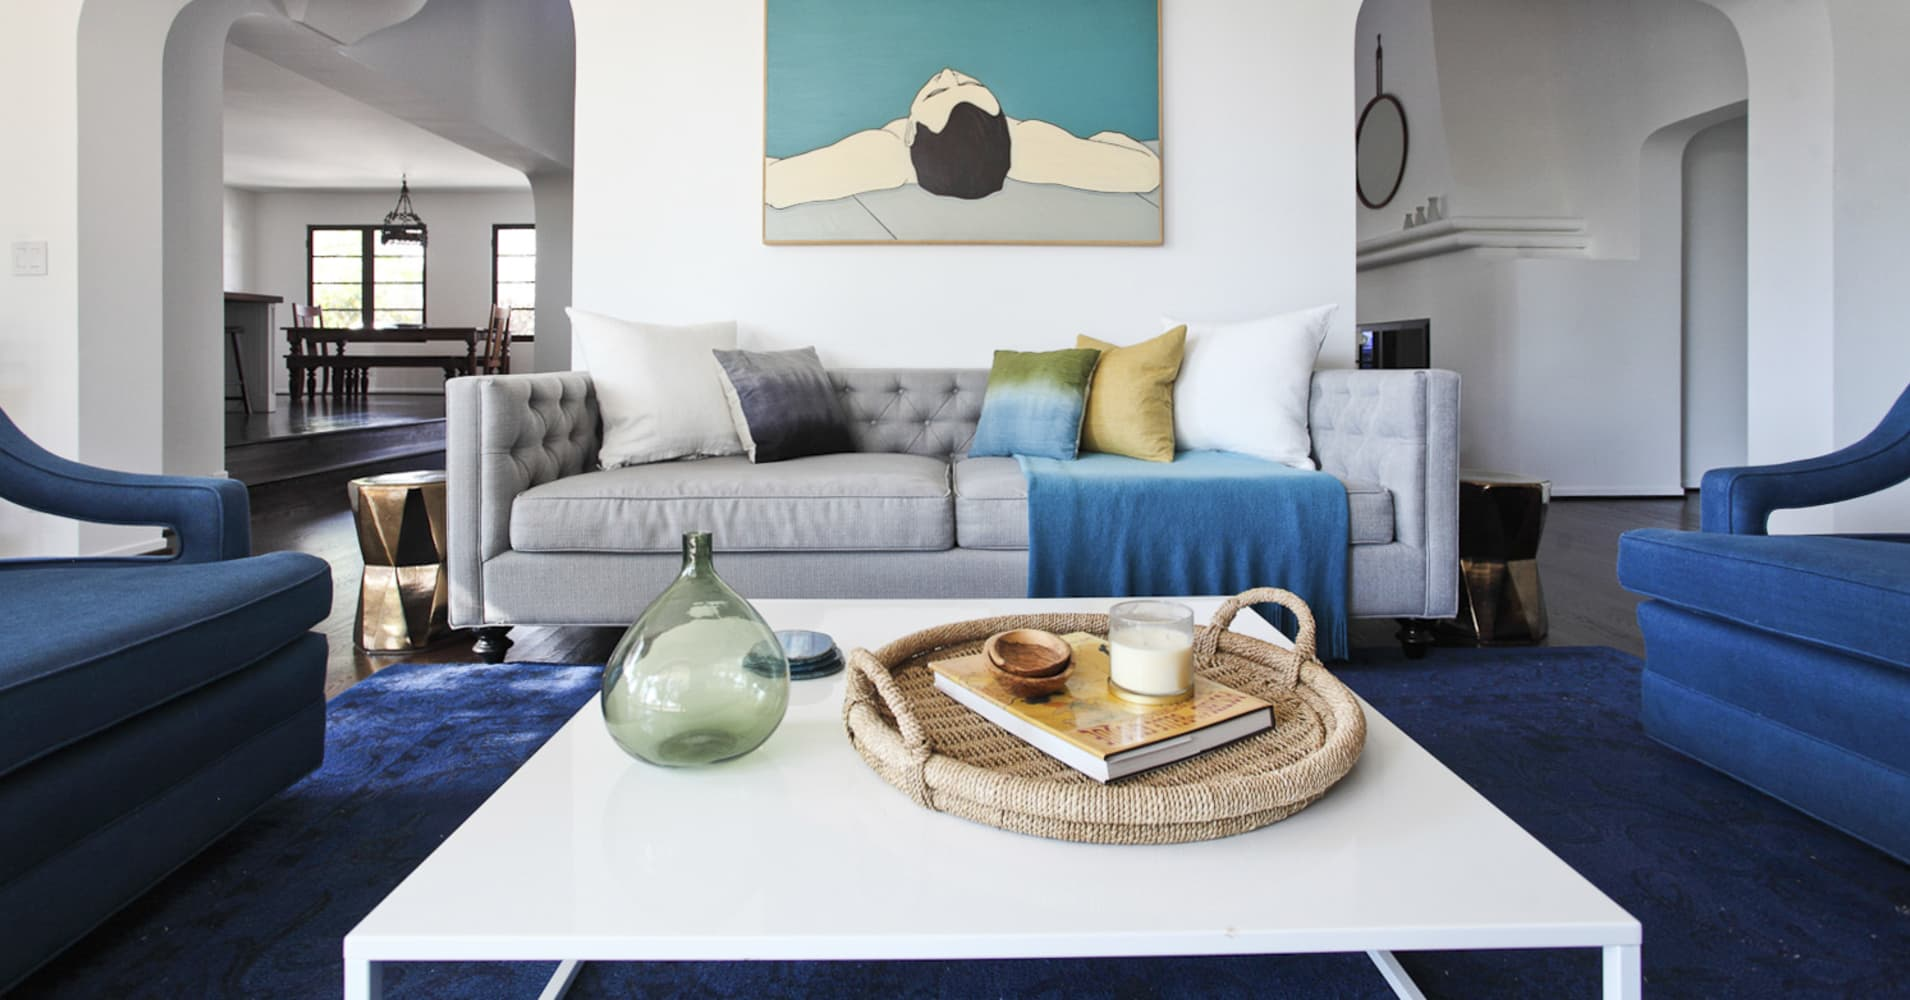 start interior design business entrepreneur where get interior design